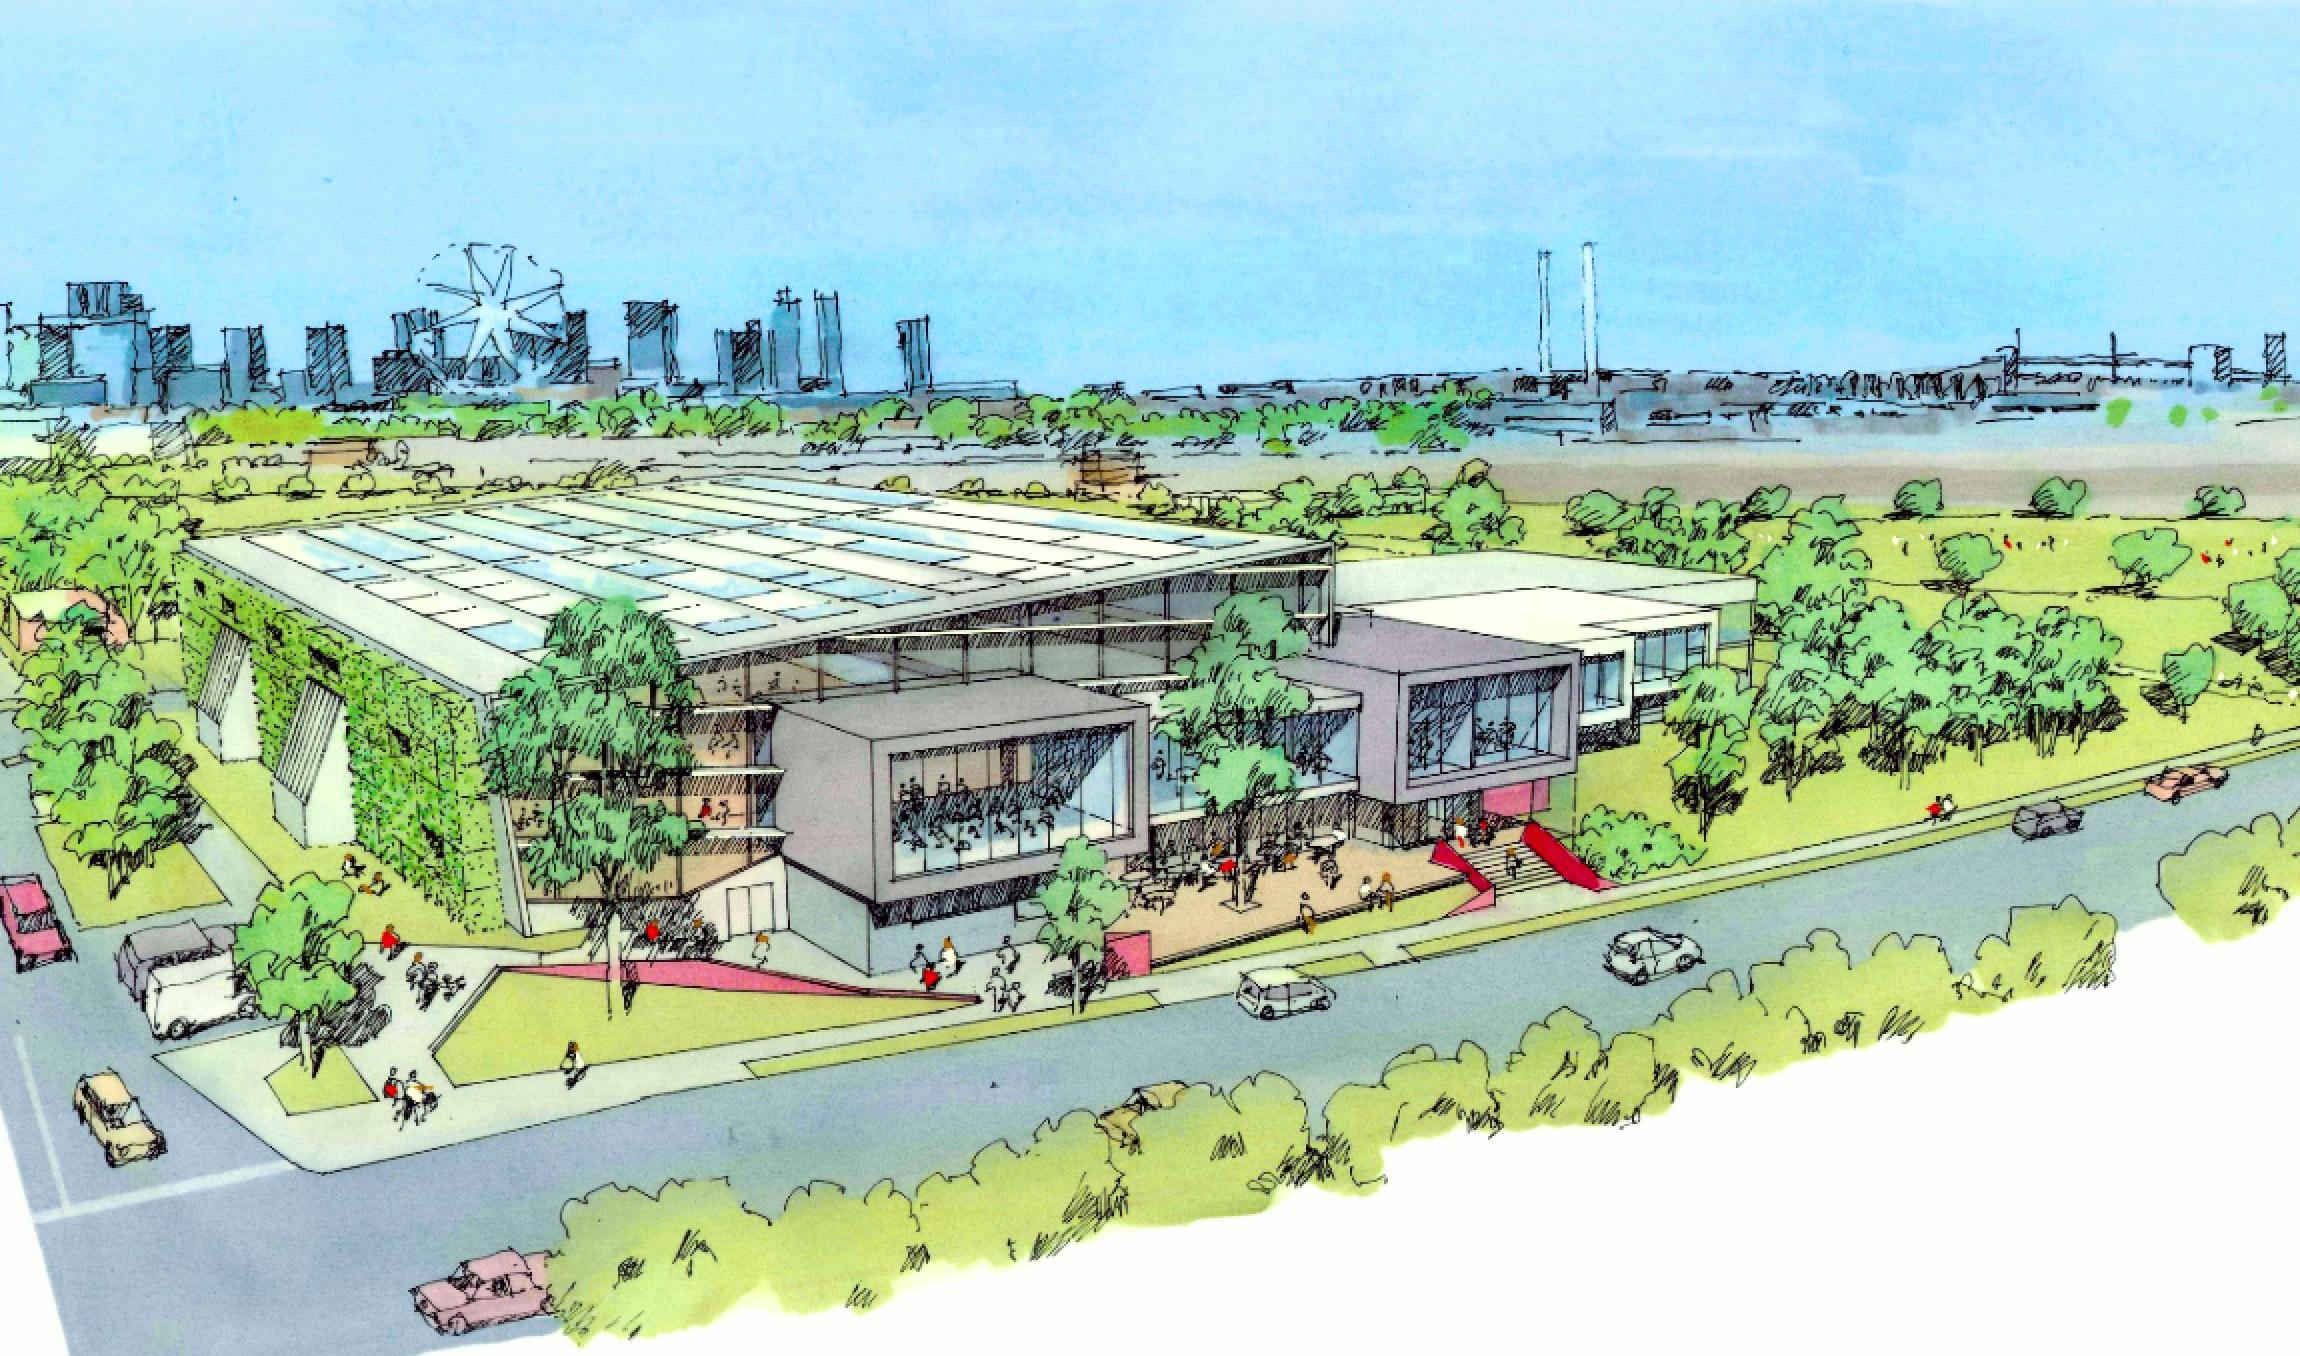 City of Melbourne releases latest concept designs for the Kensington Community Recreation Centre